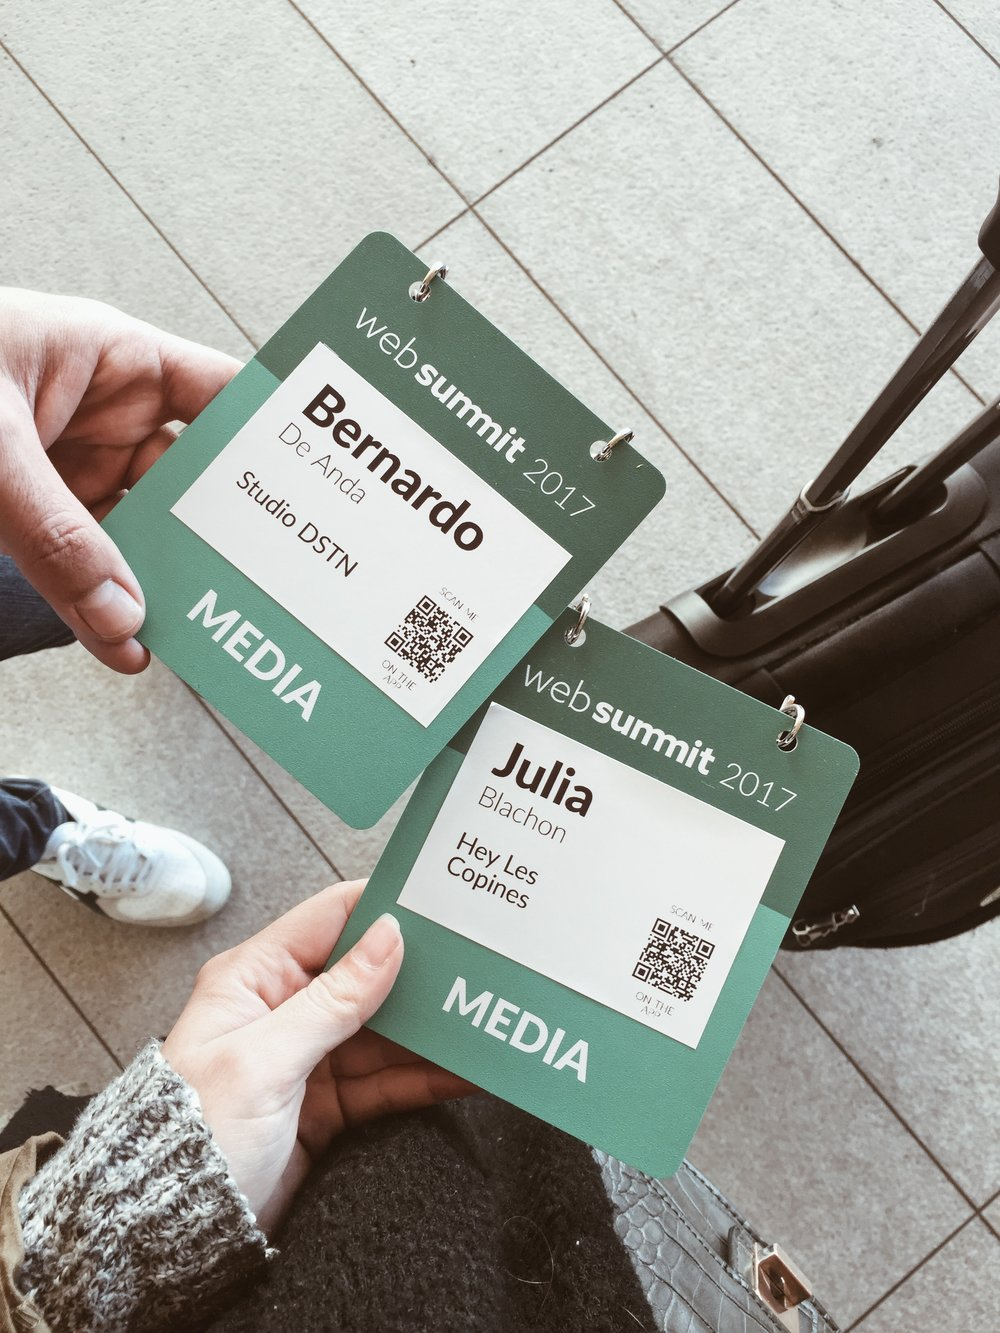 Web-summit-lisbon-20171.JPG